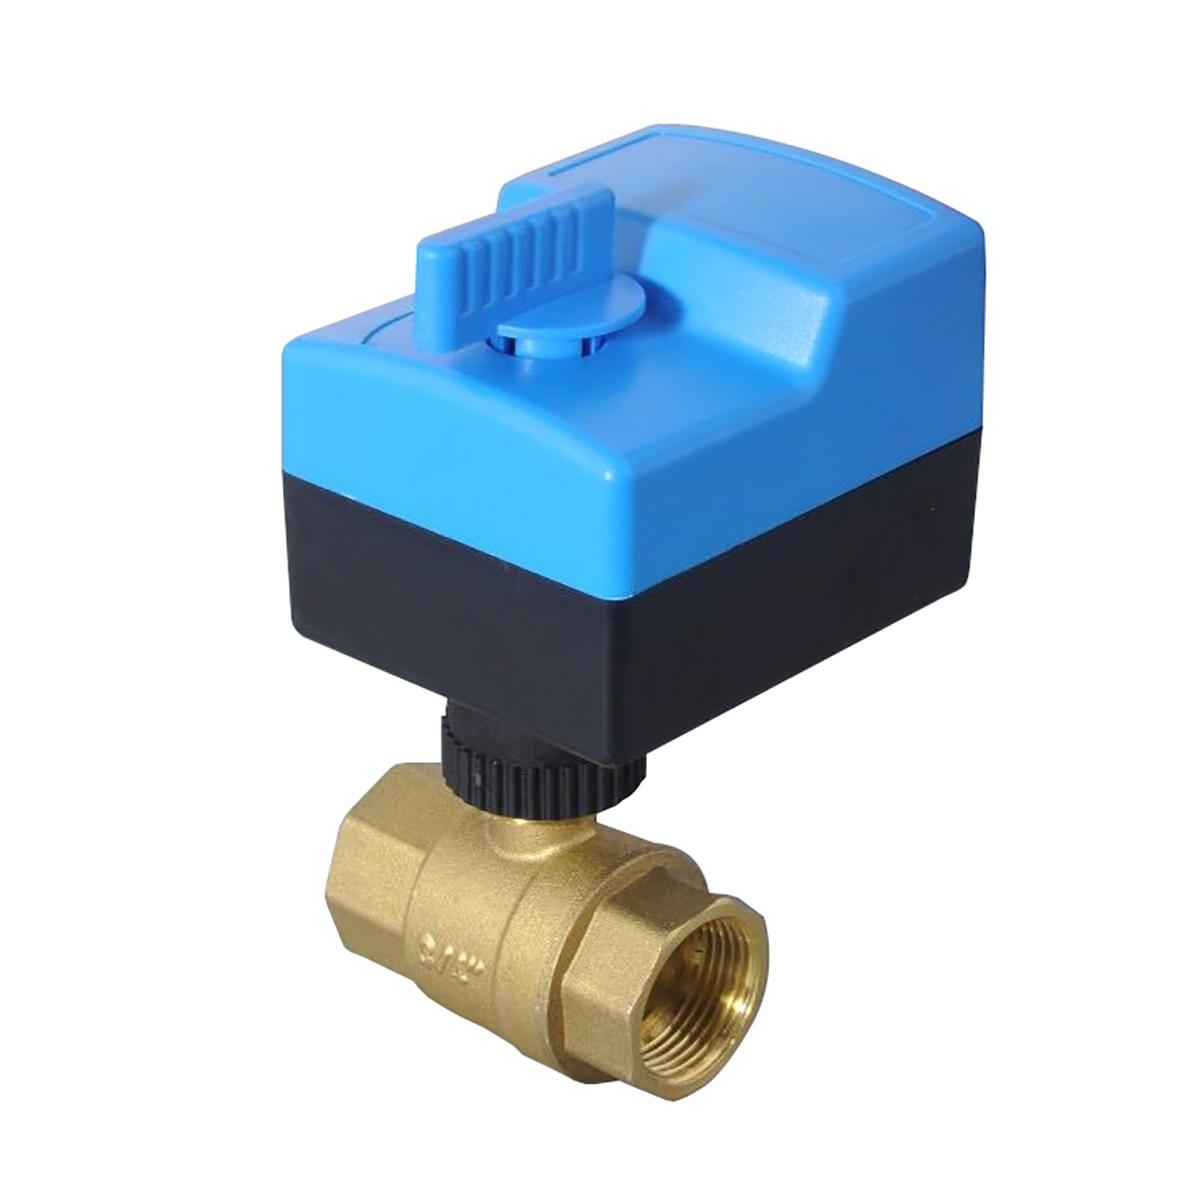 AC220V AC24V 2 طريقة النحاس صمام صمام كروي مزود بمحرك الكرة الكهربائية صمام المحرك الكهربائي مع التلقائي واليدوي DN15-DN25